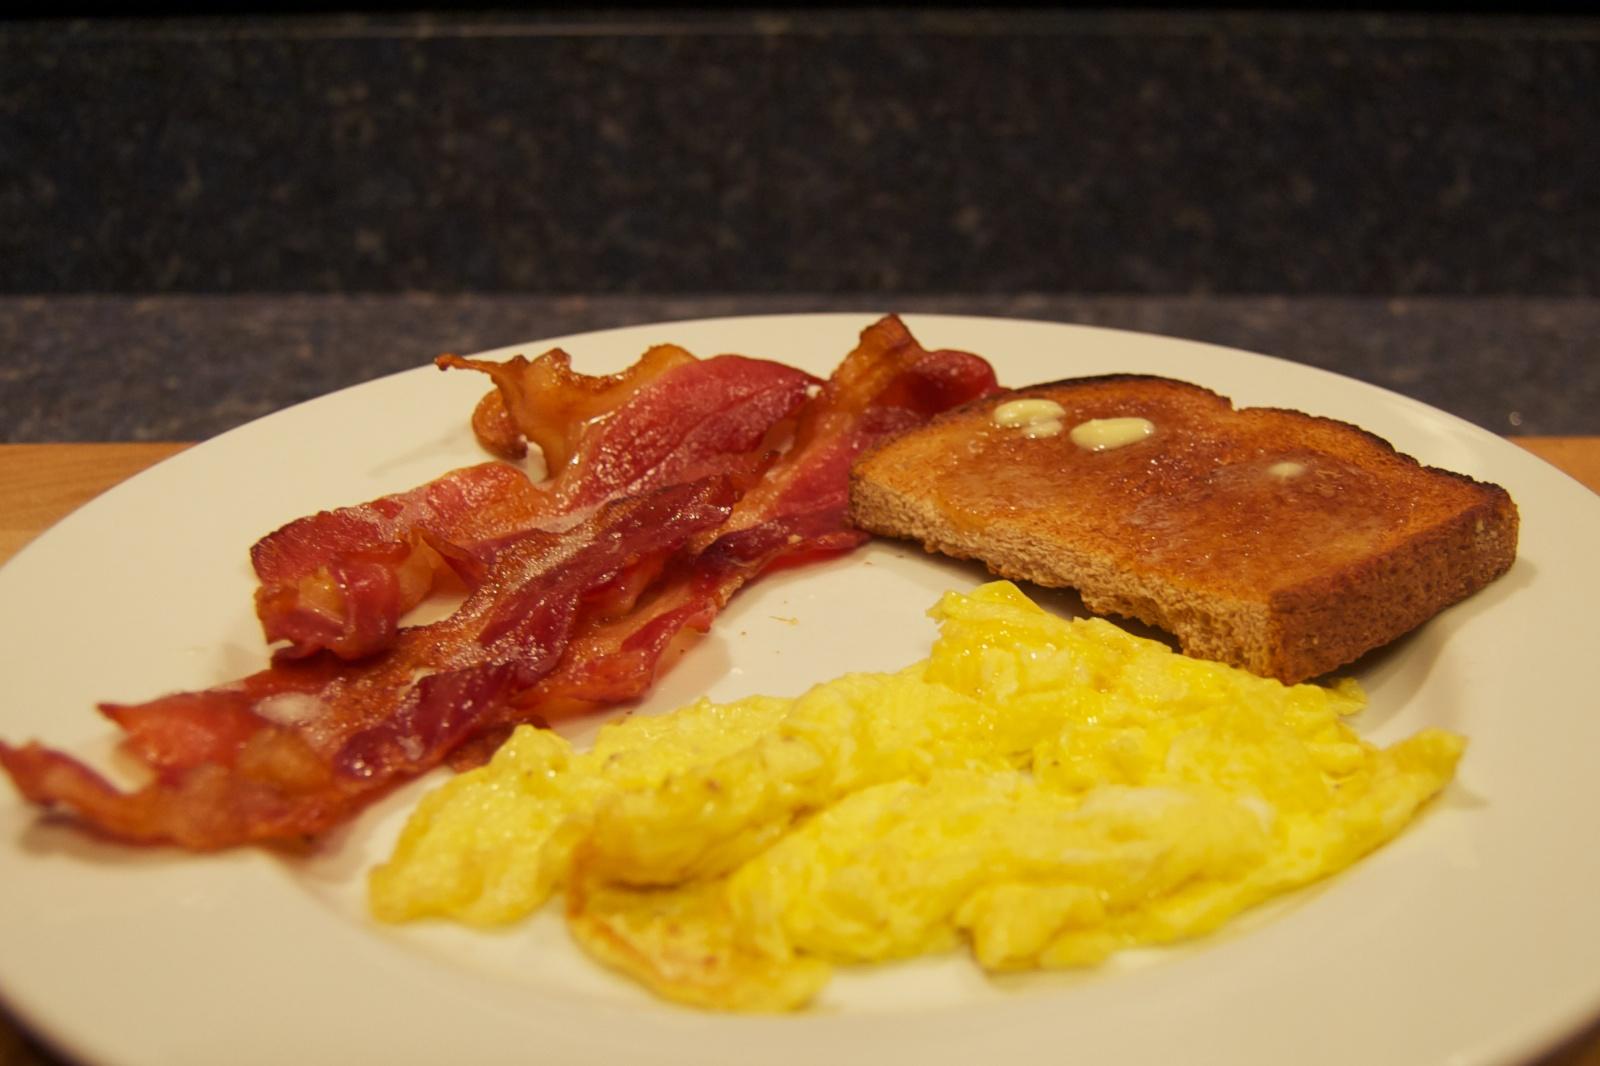 http://blog.rickk.com/food/2013/03/11/ate.2013.03.11.b.jpg